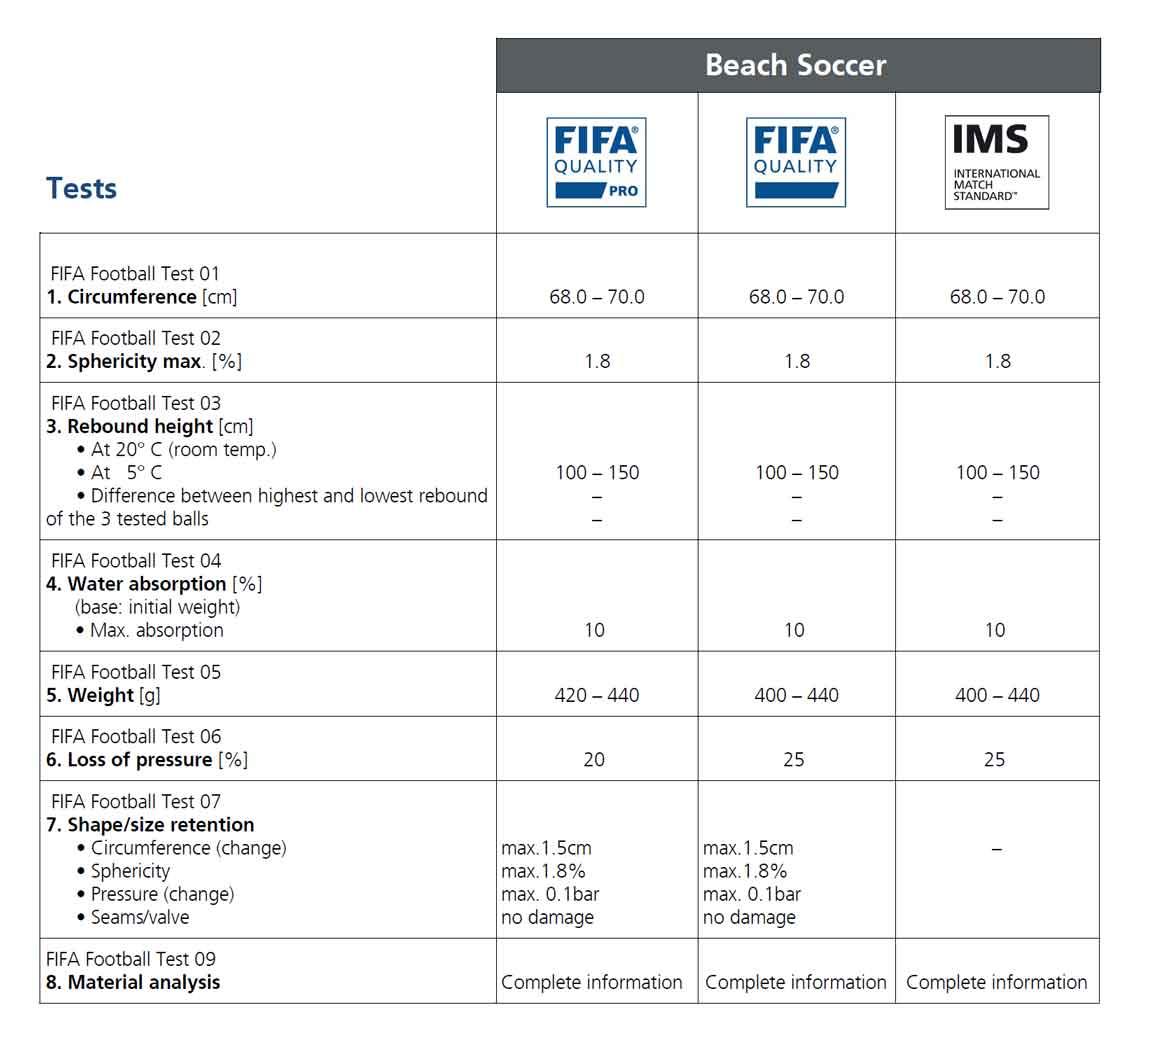 таблица показателей для мяча ims